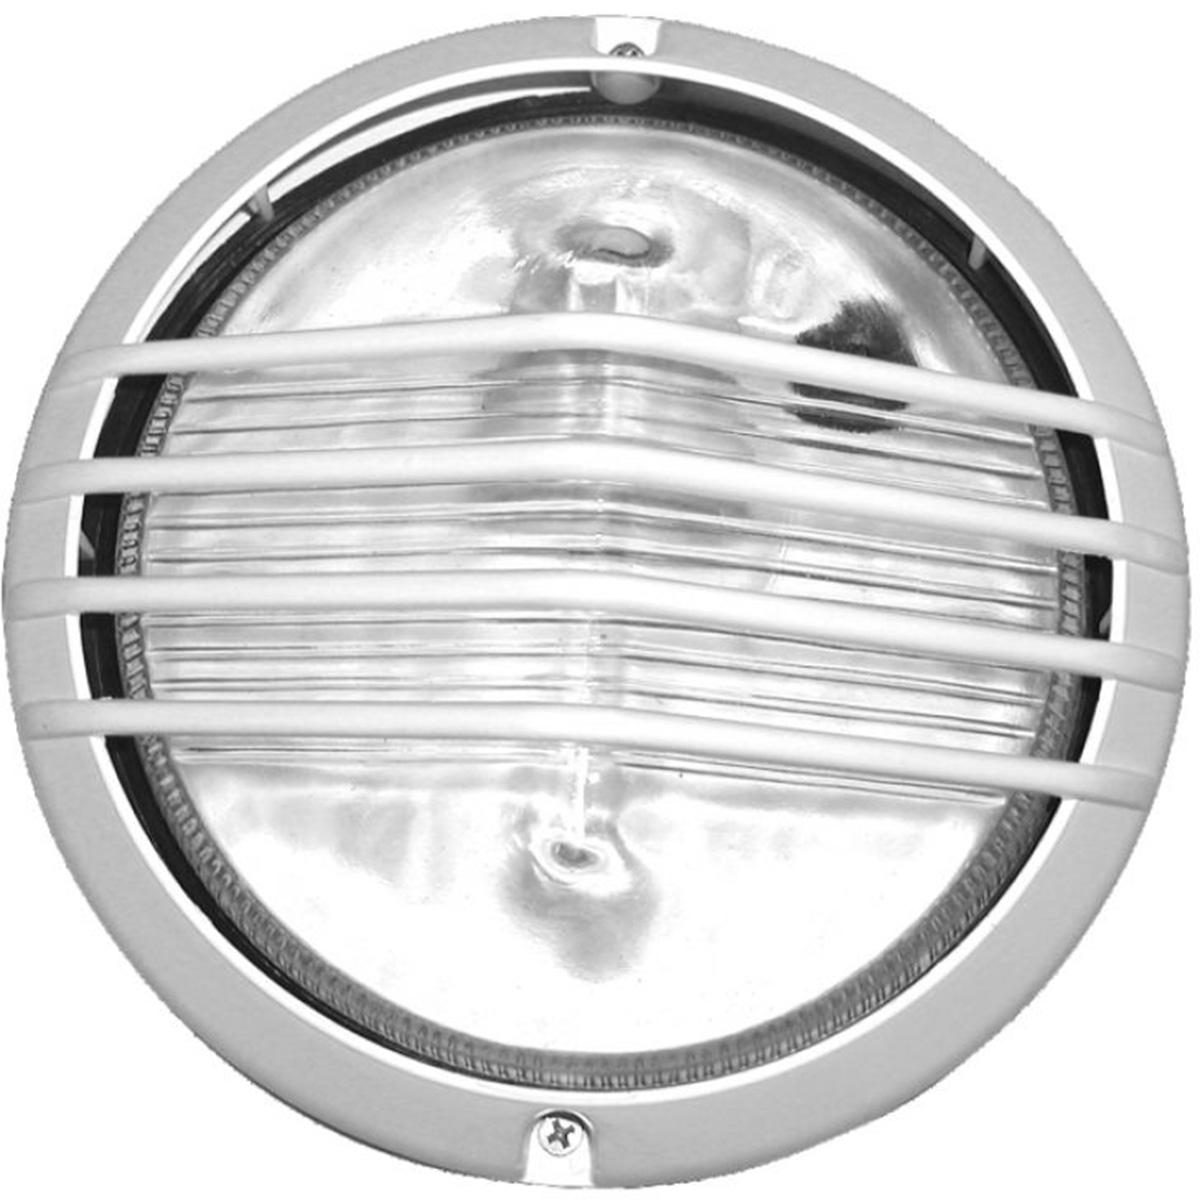 Tartaruga Piramide Circular 19cm Aluminio Pint. Epoxi E-27 1 Lamp. Max 60w Branca